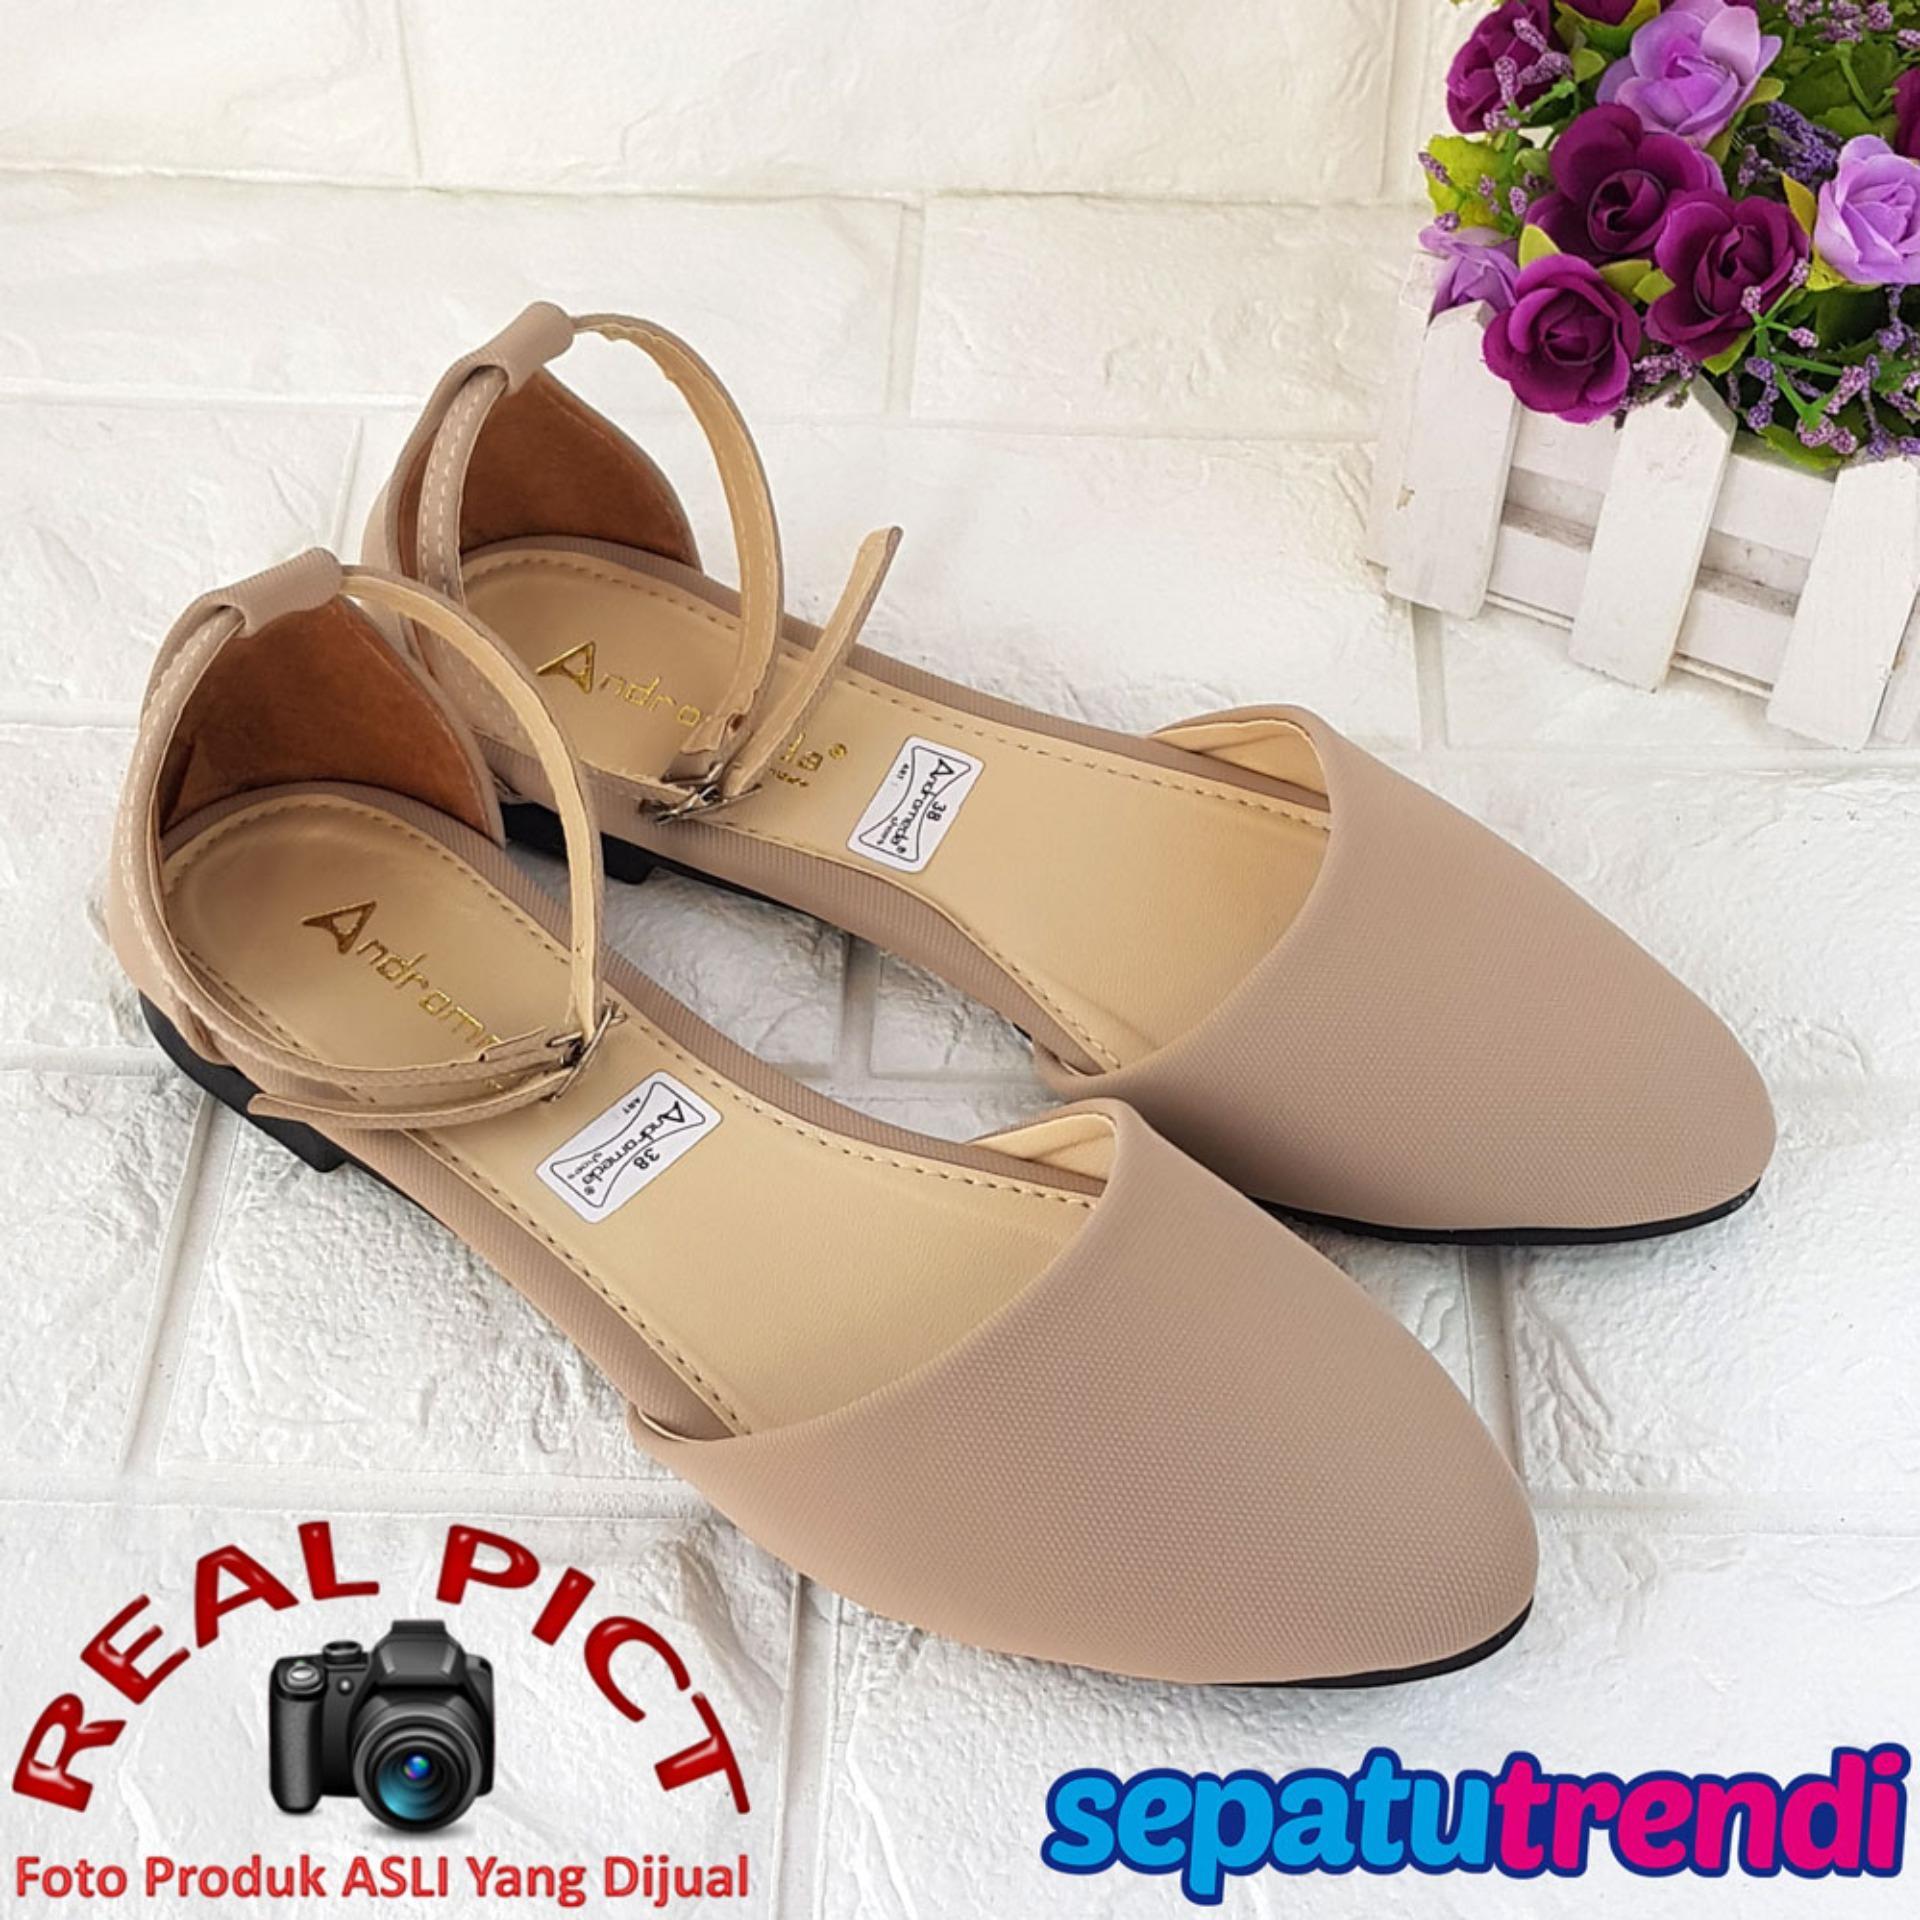 Toko Trendi Sepatu Wanita Flat Shoes D Orsay Ankle Strap Gelang Soglg Lengkap Di Jawa Barat